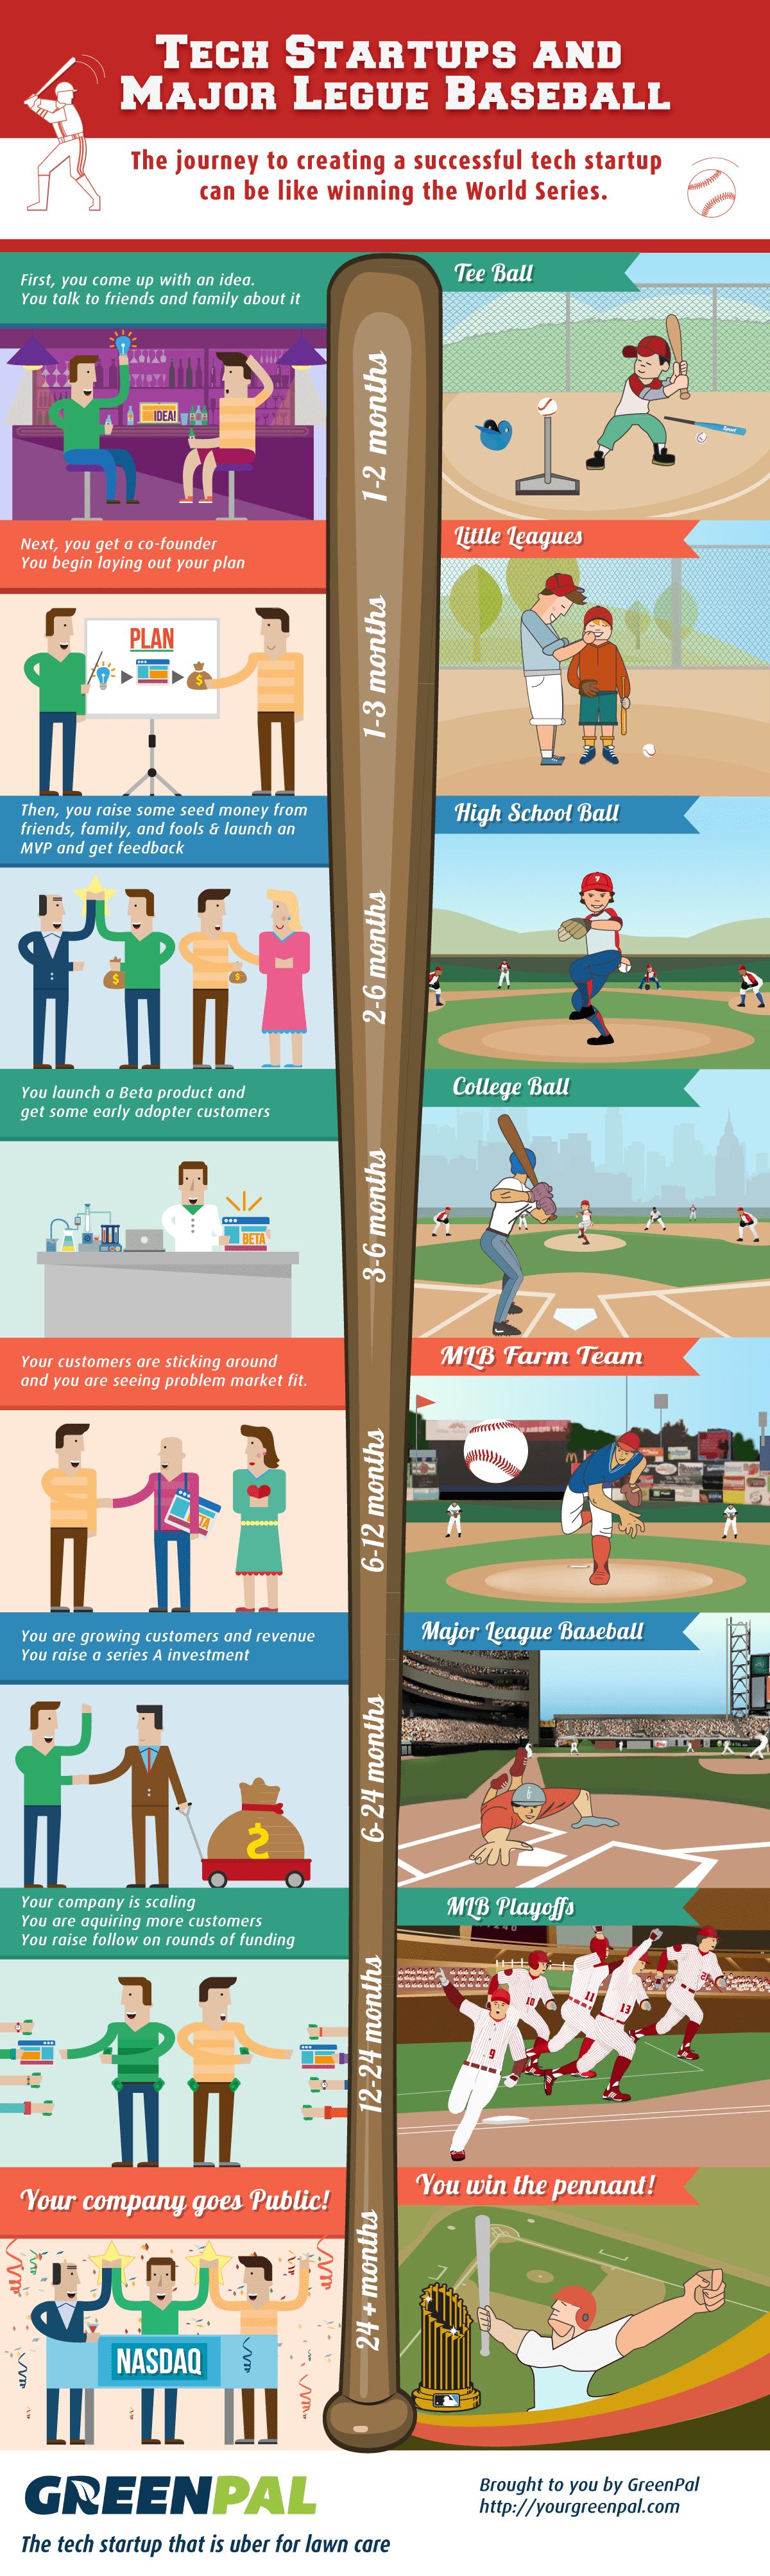 Baseball infographic2 min